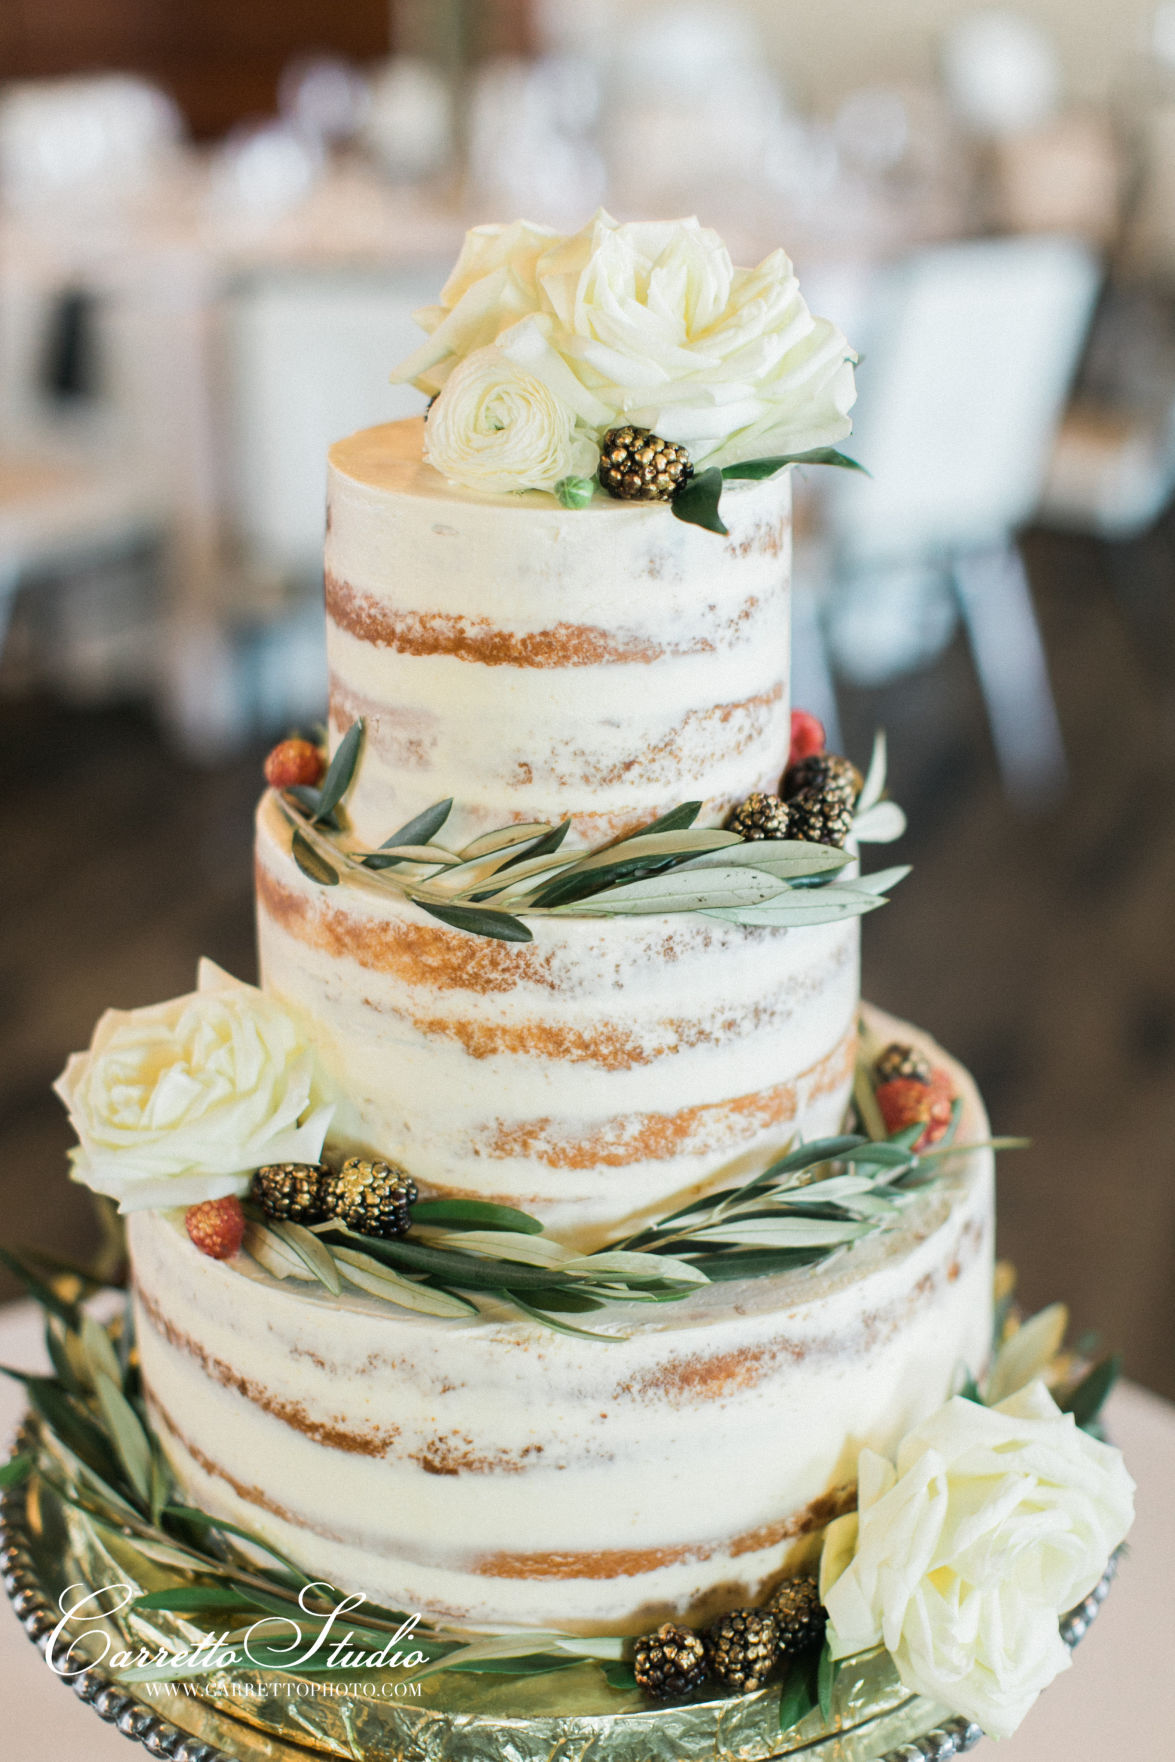 Custom Cakes | Weddings | laduenews.com